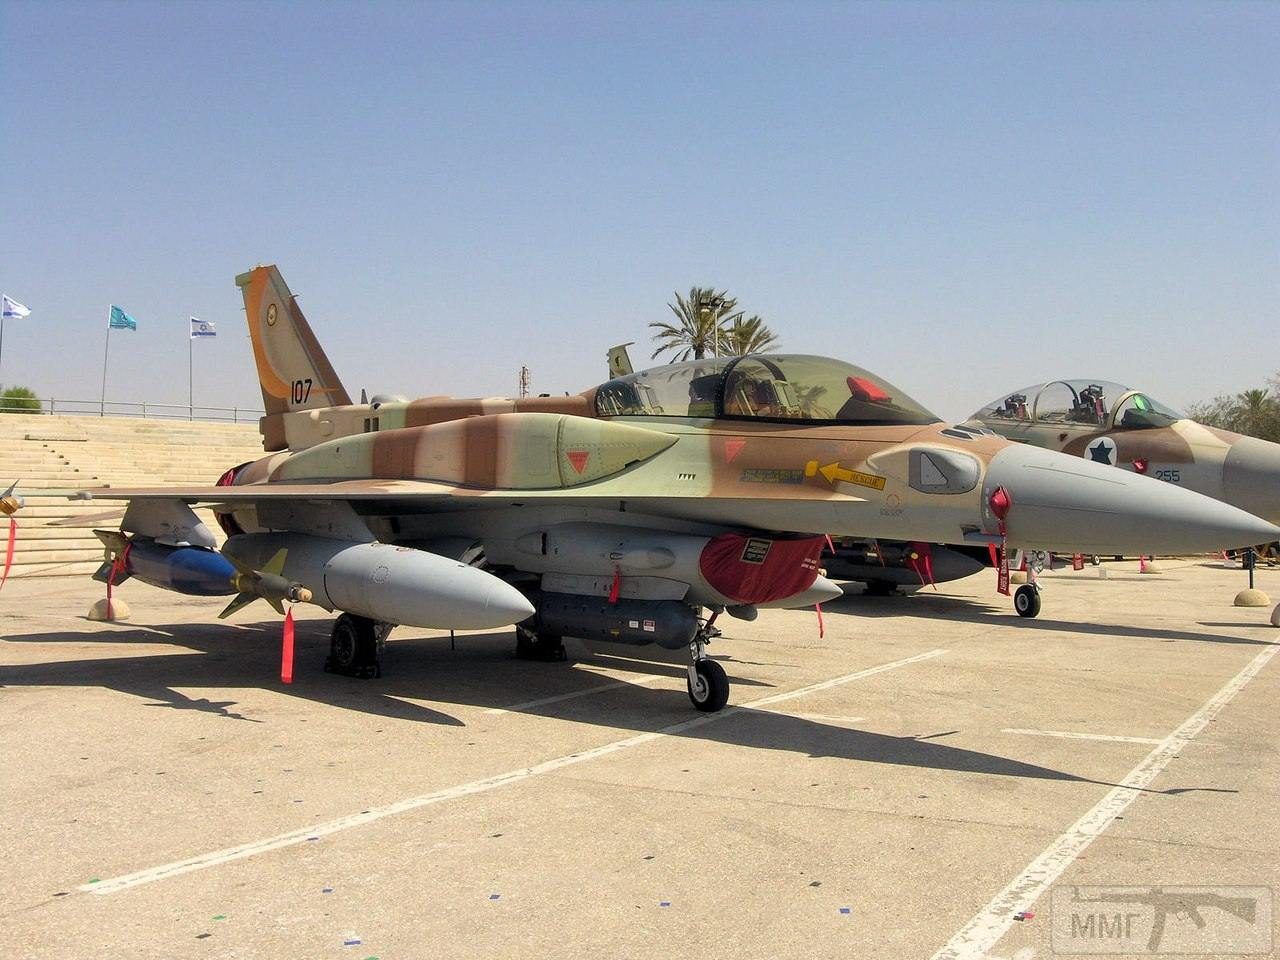 21897 - ВВС Израиля в бою